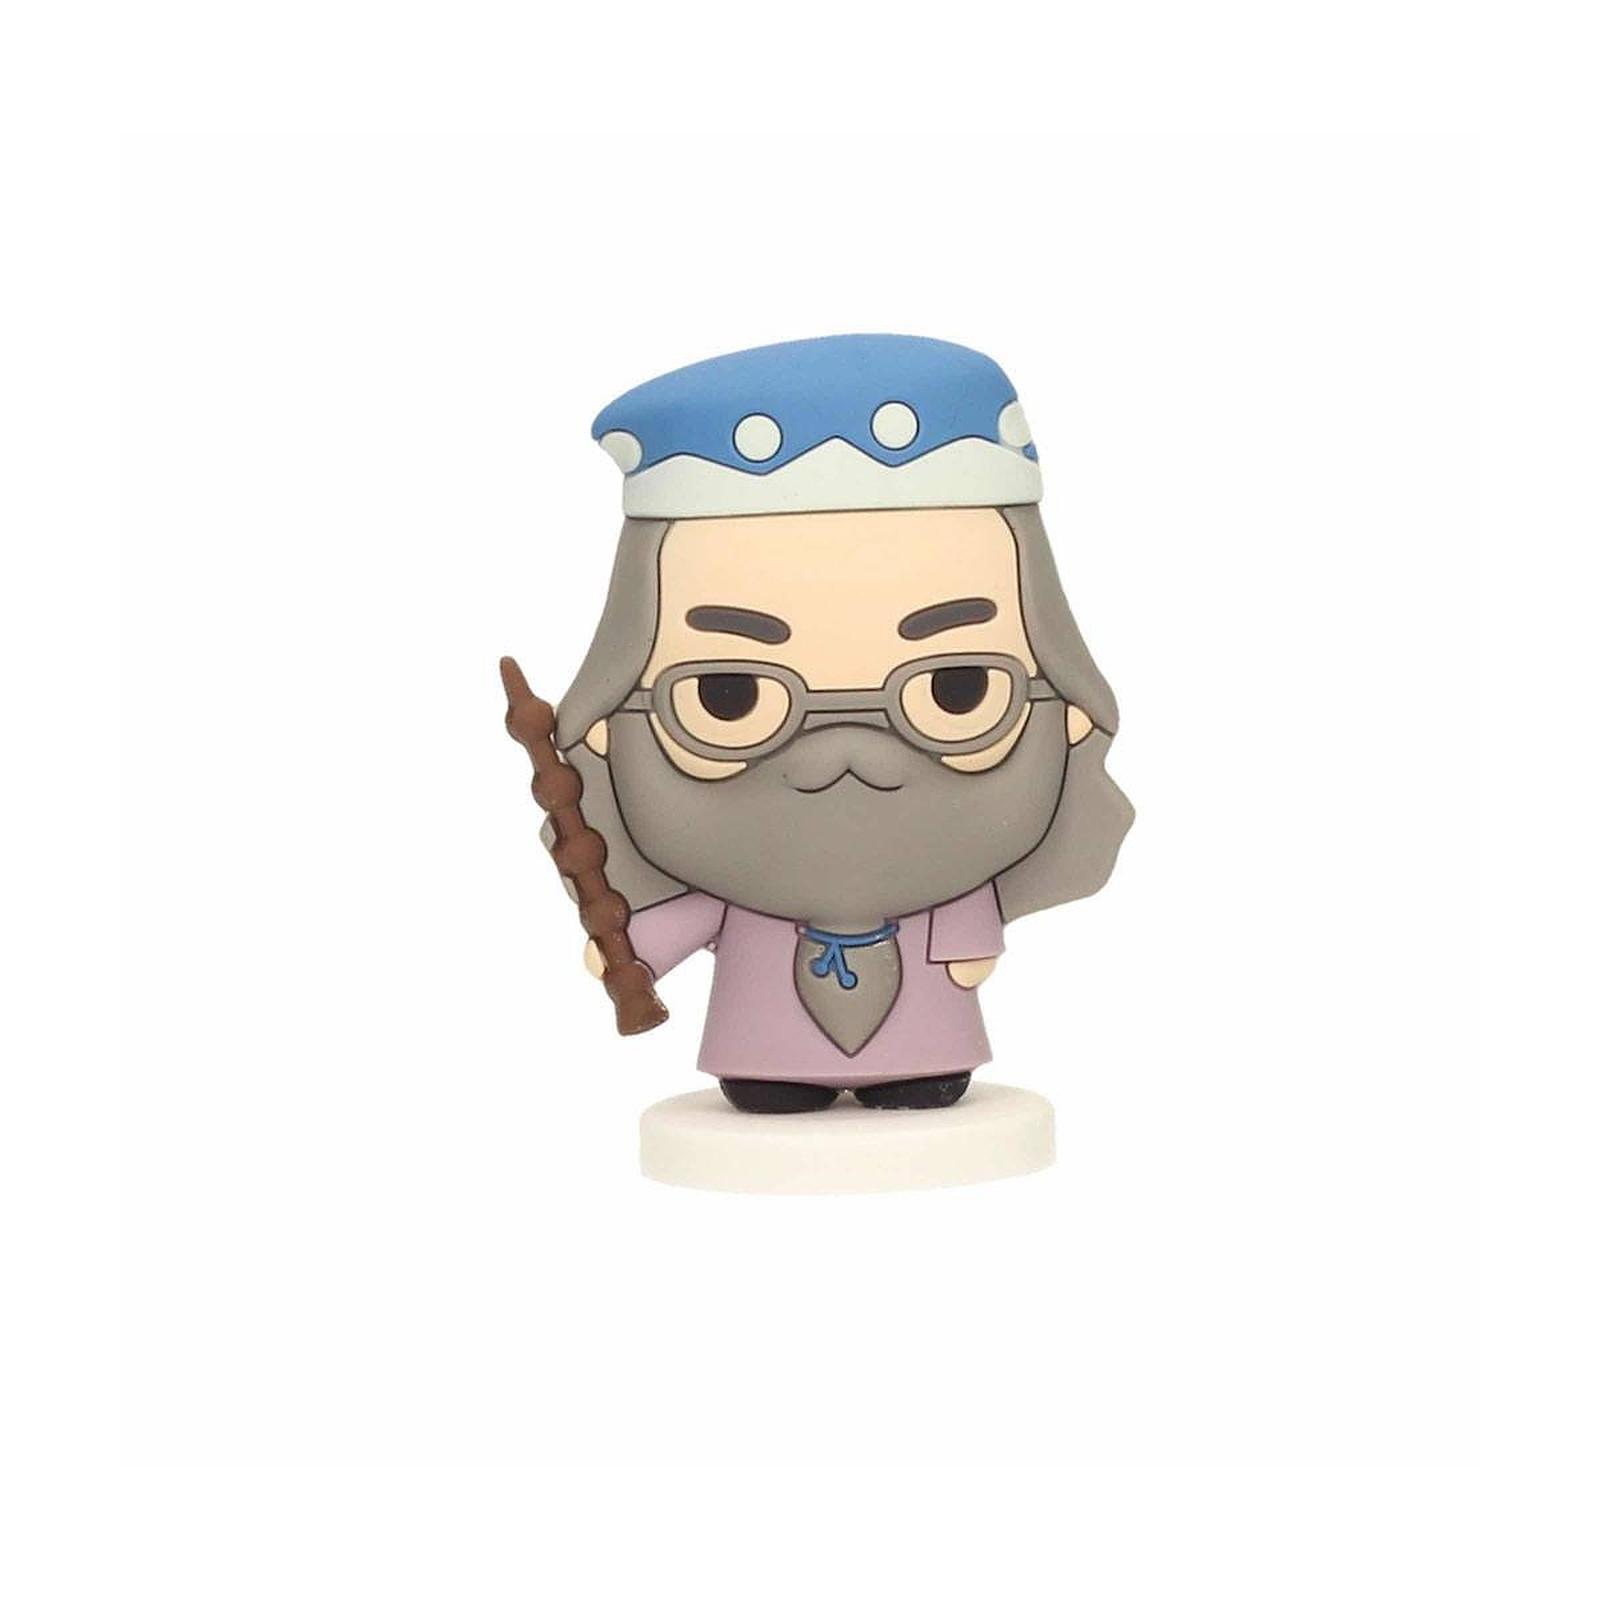 Harry Potter - Figurine Pokis Dumbledore 6 cm